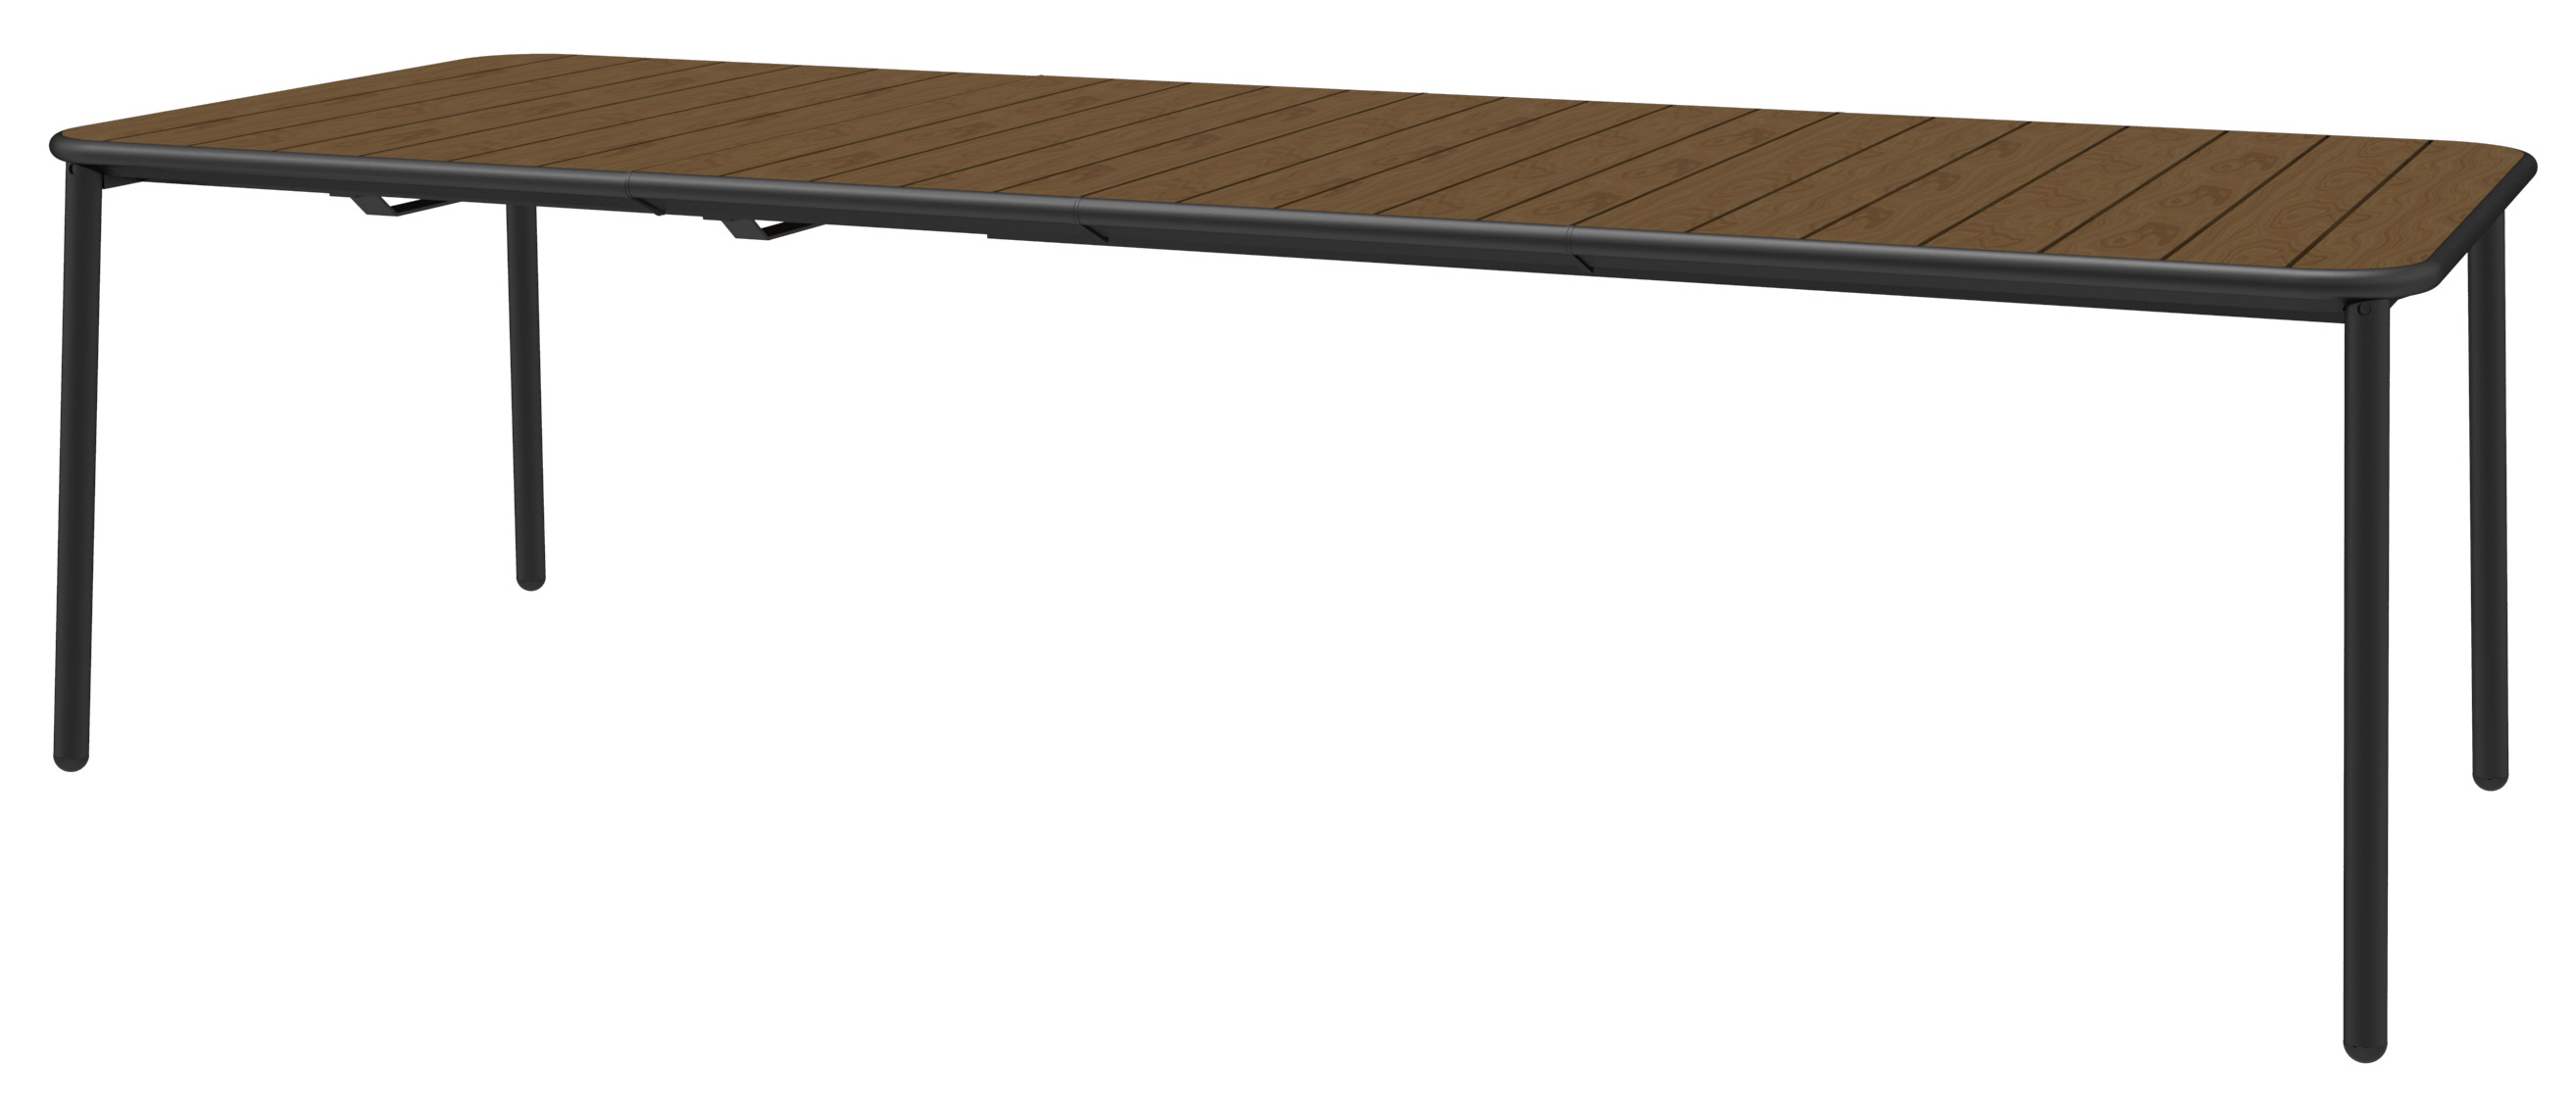 emuamericas, llc 535 table, outdoor